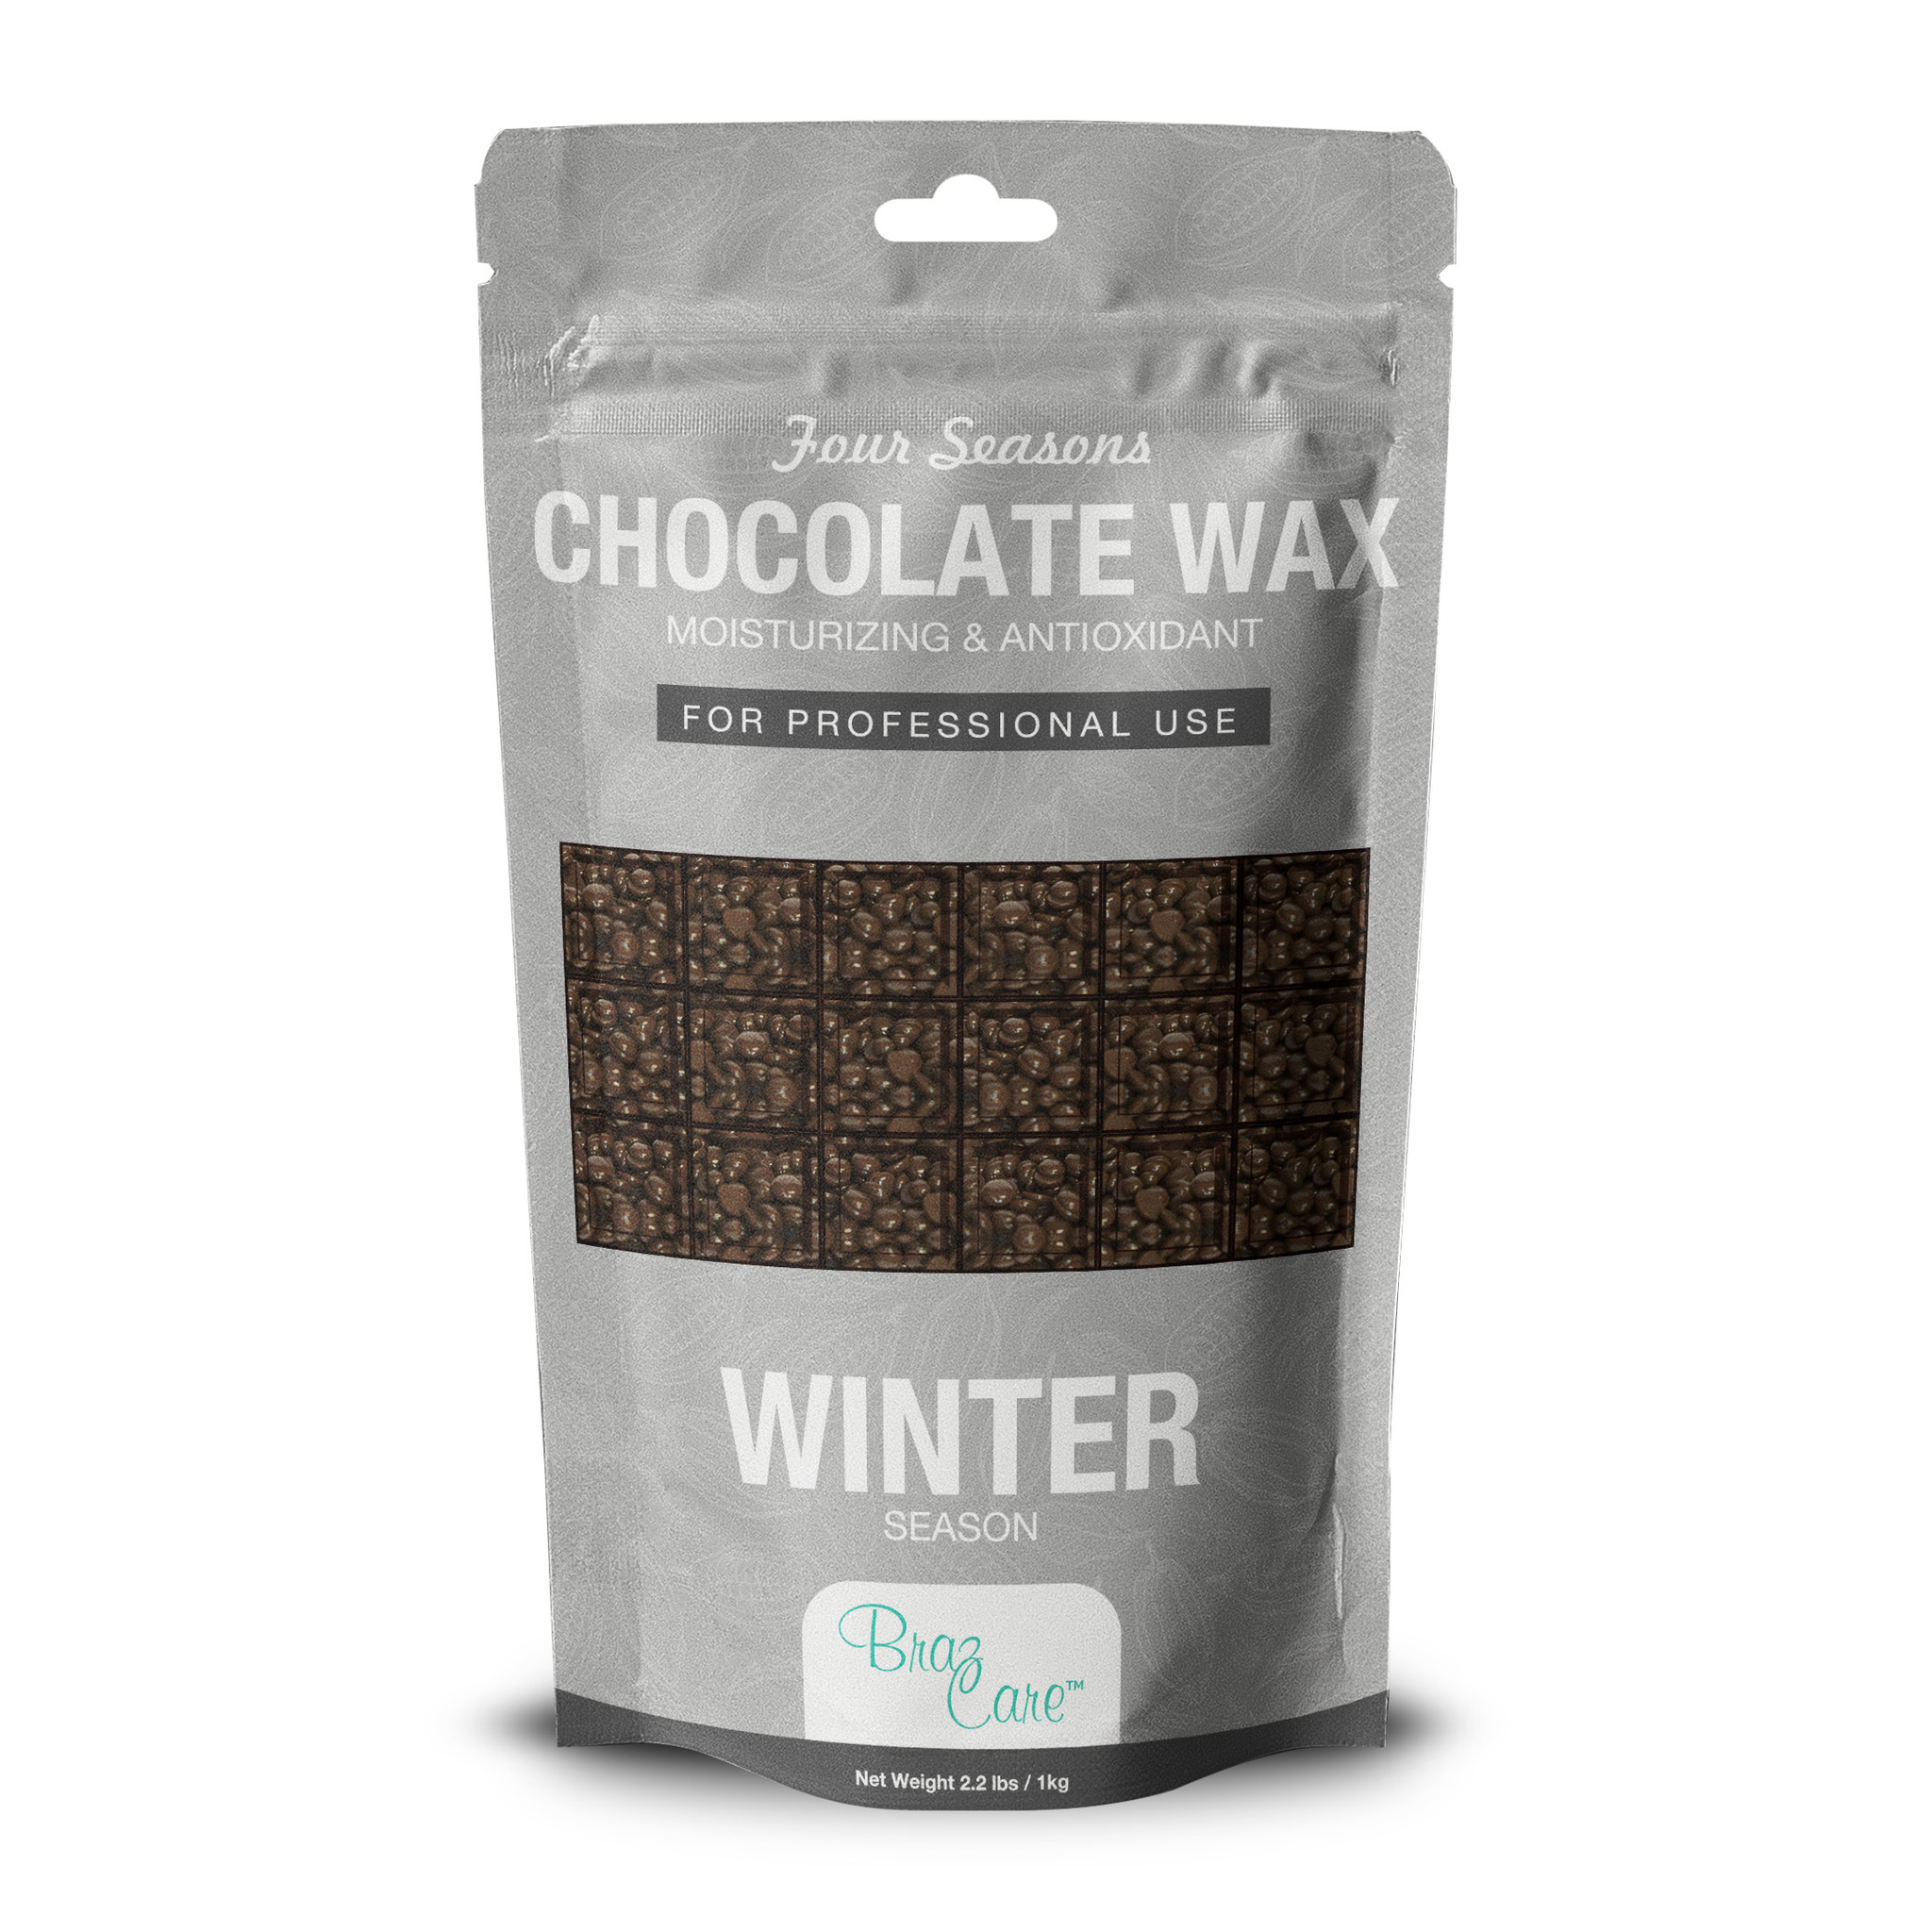 Hard Wax Chocolate 2.2lb - Box of 12 units ($12.90/Ea)